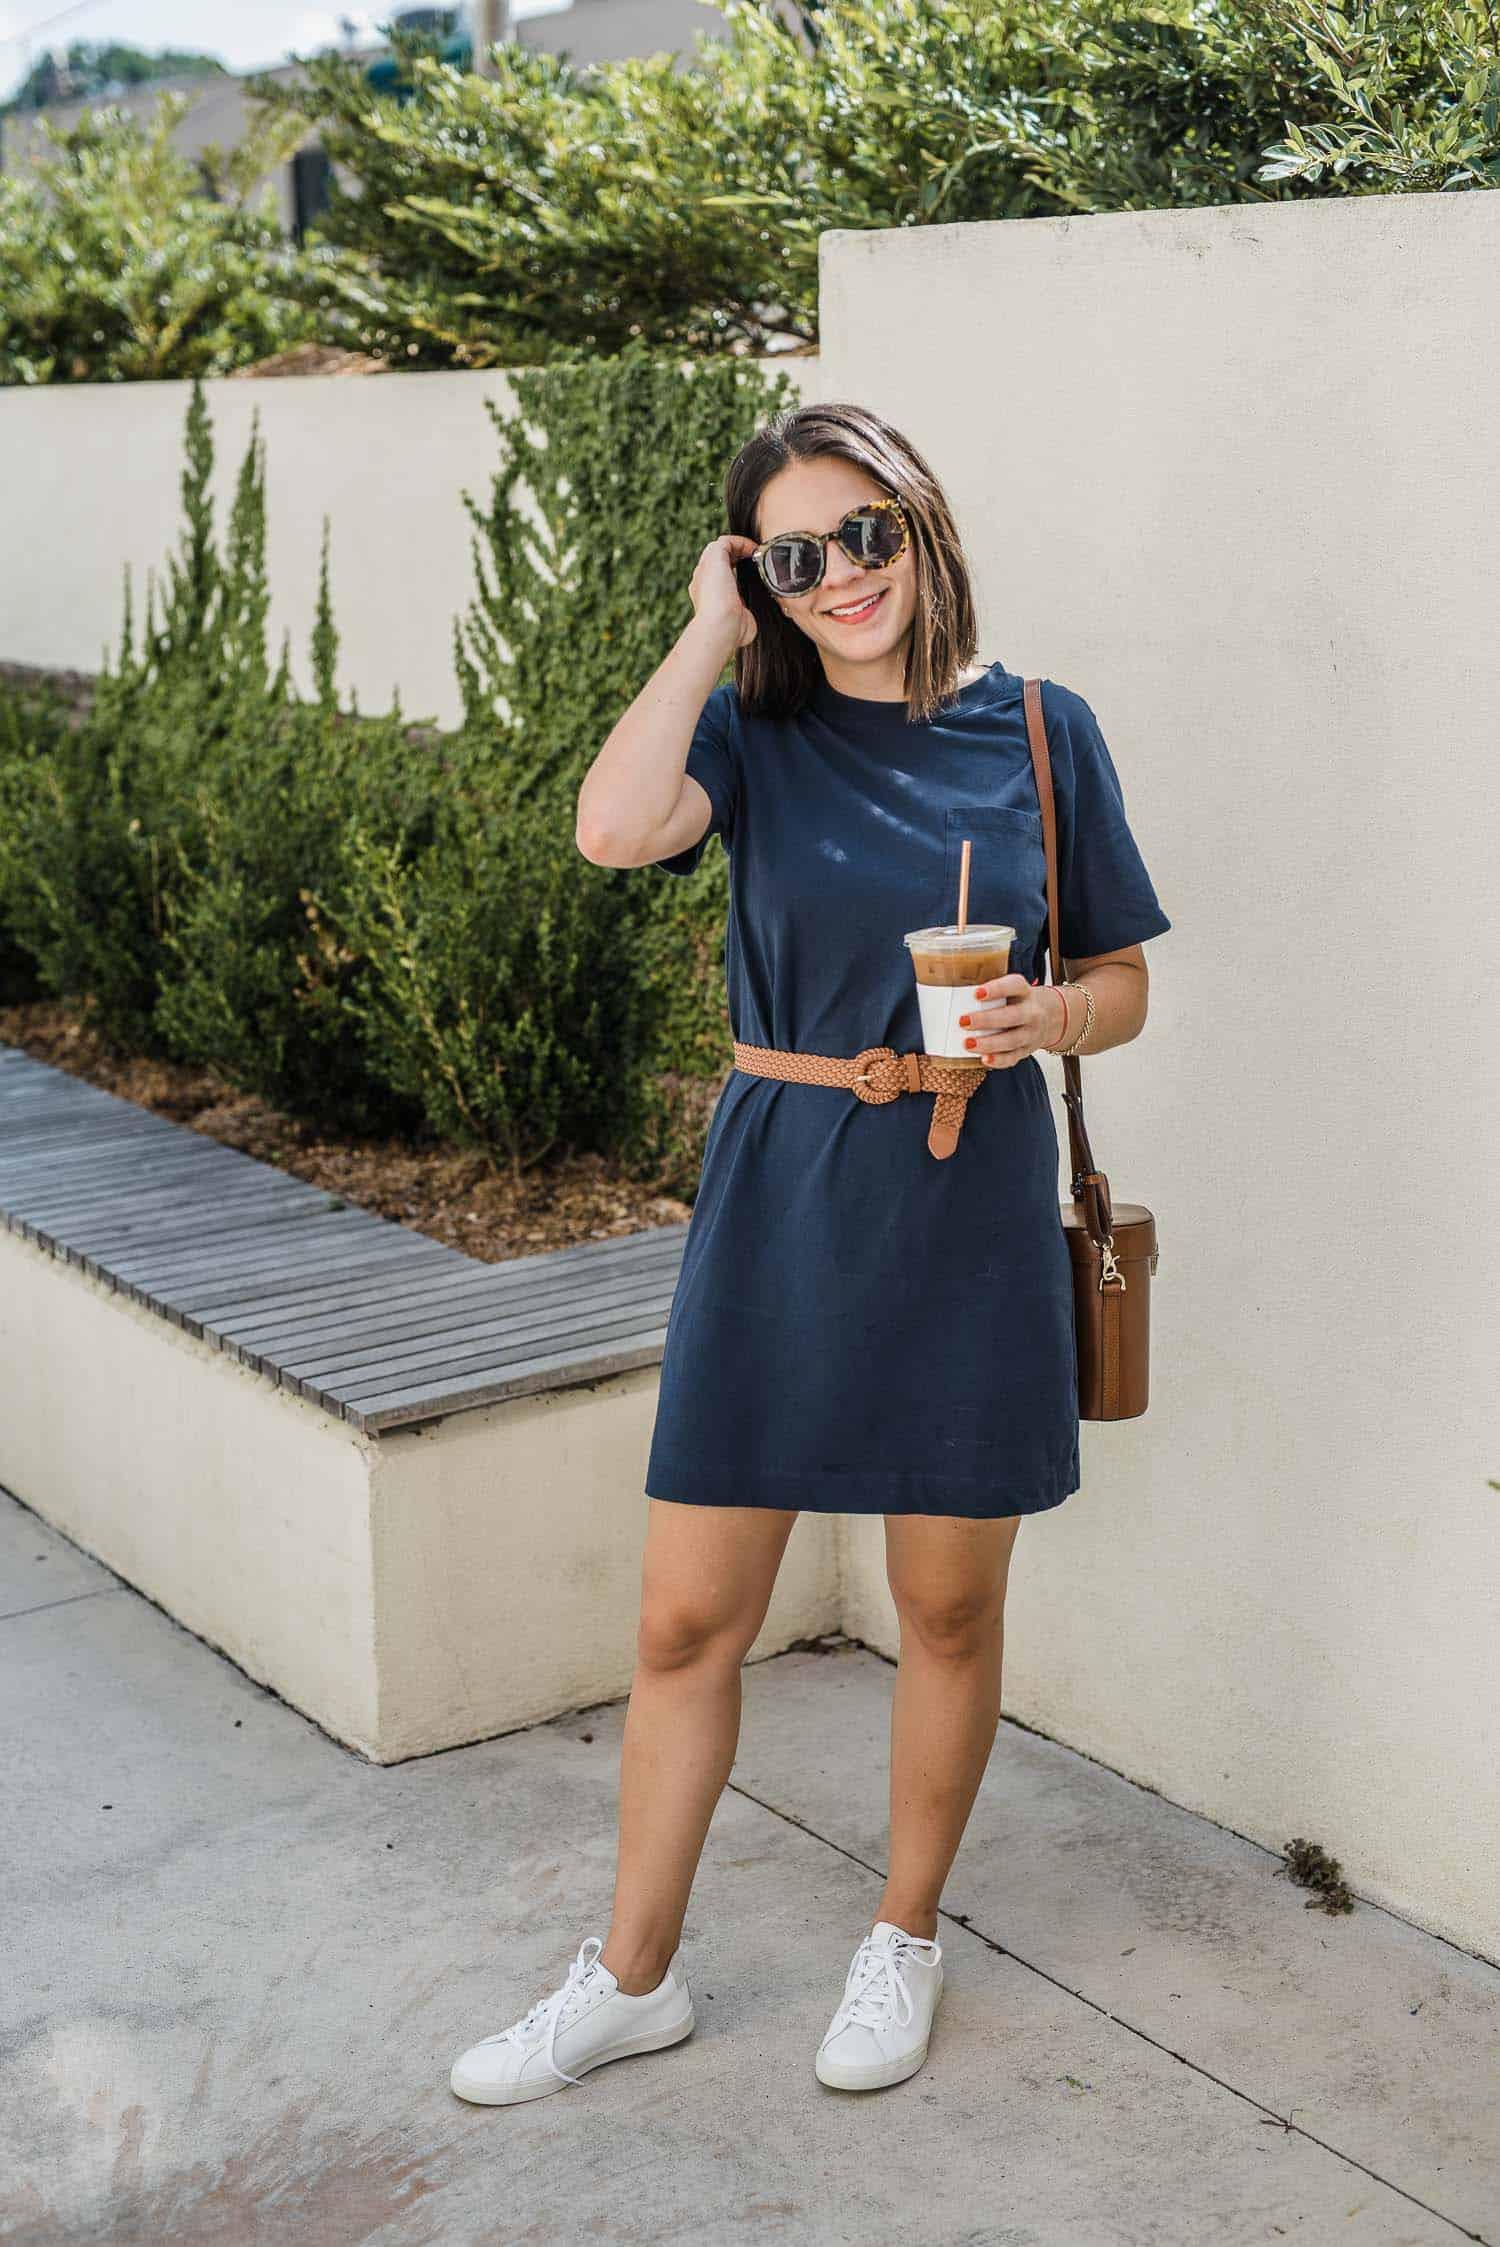 Jessica dresses to impress in a t-shirt dress